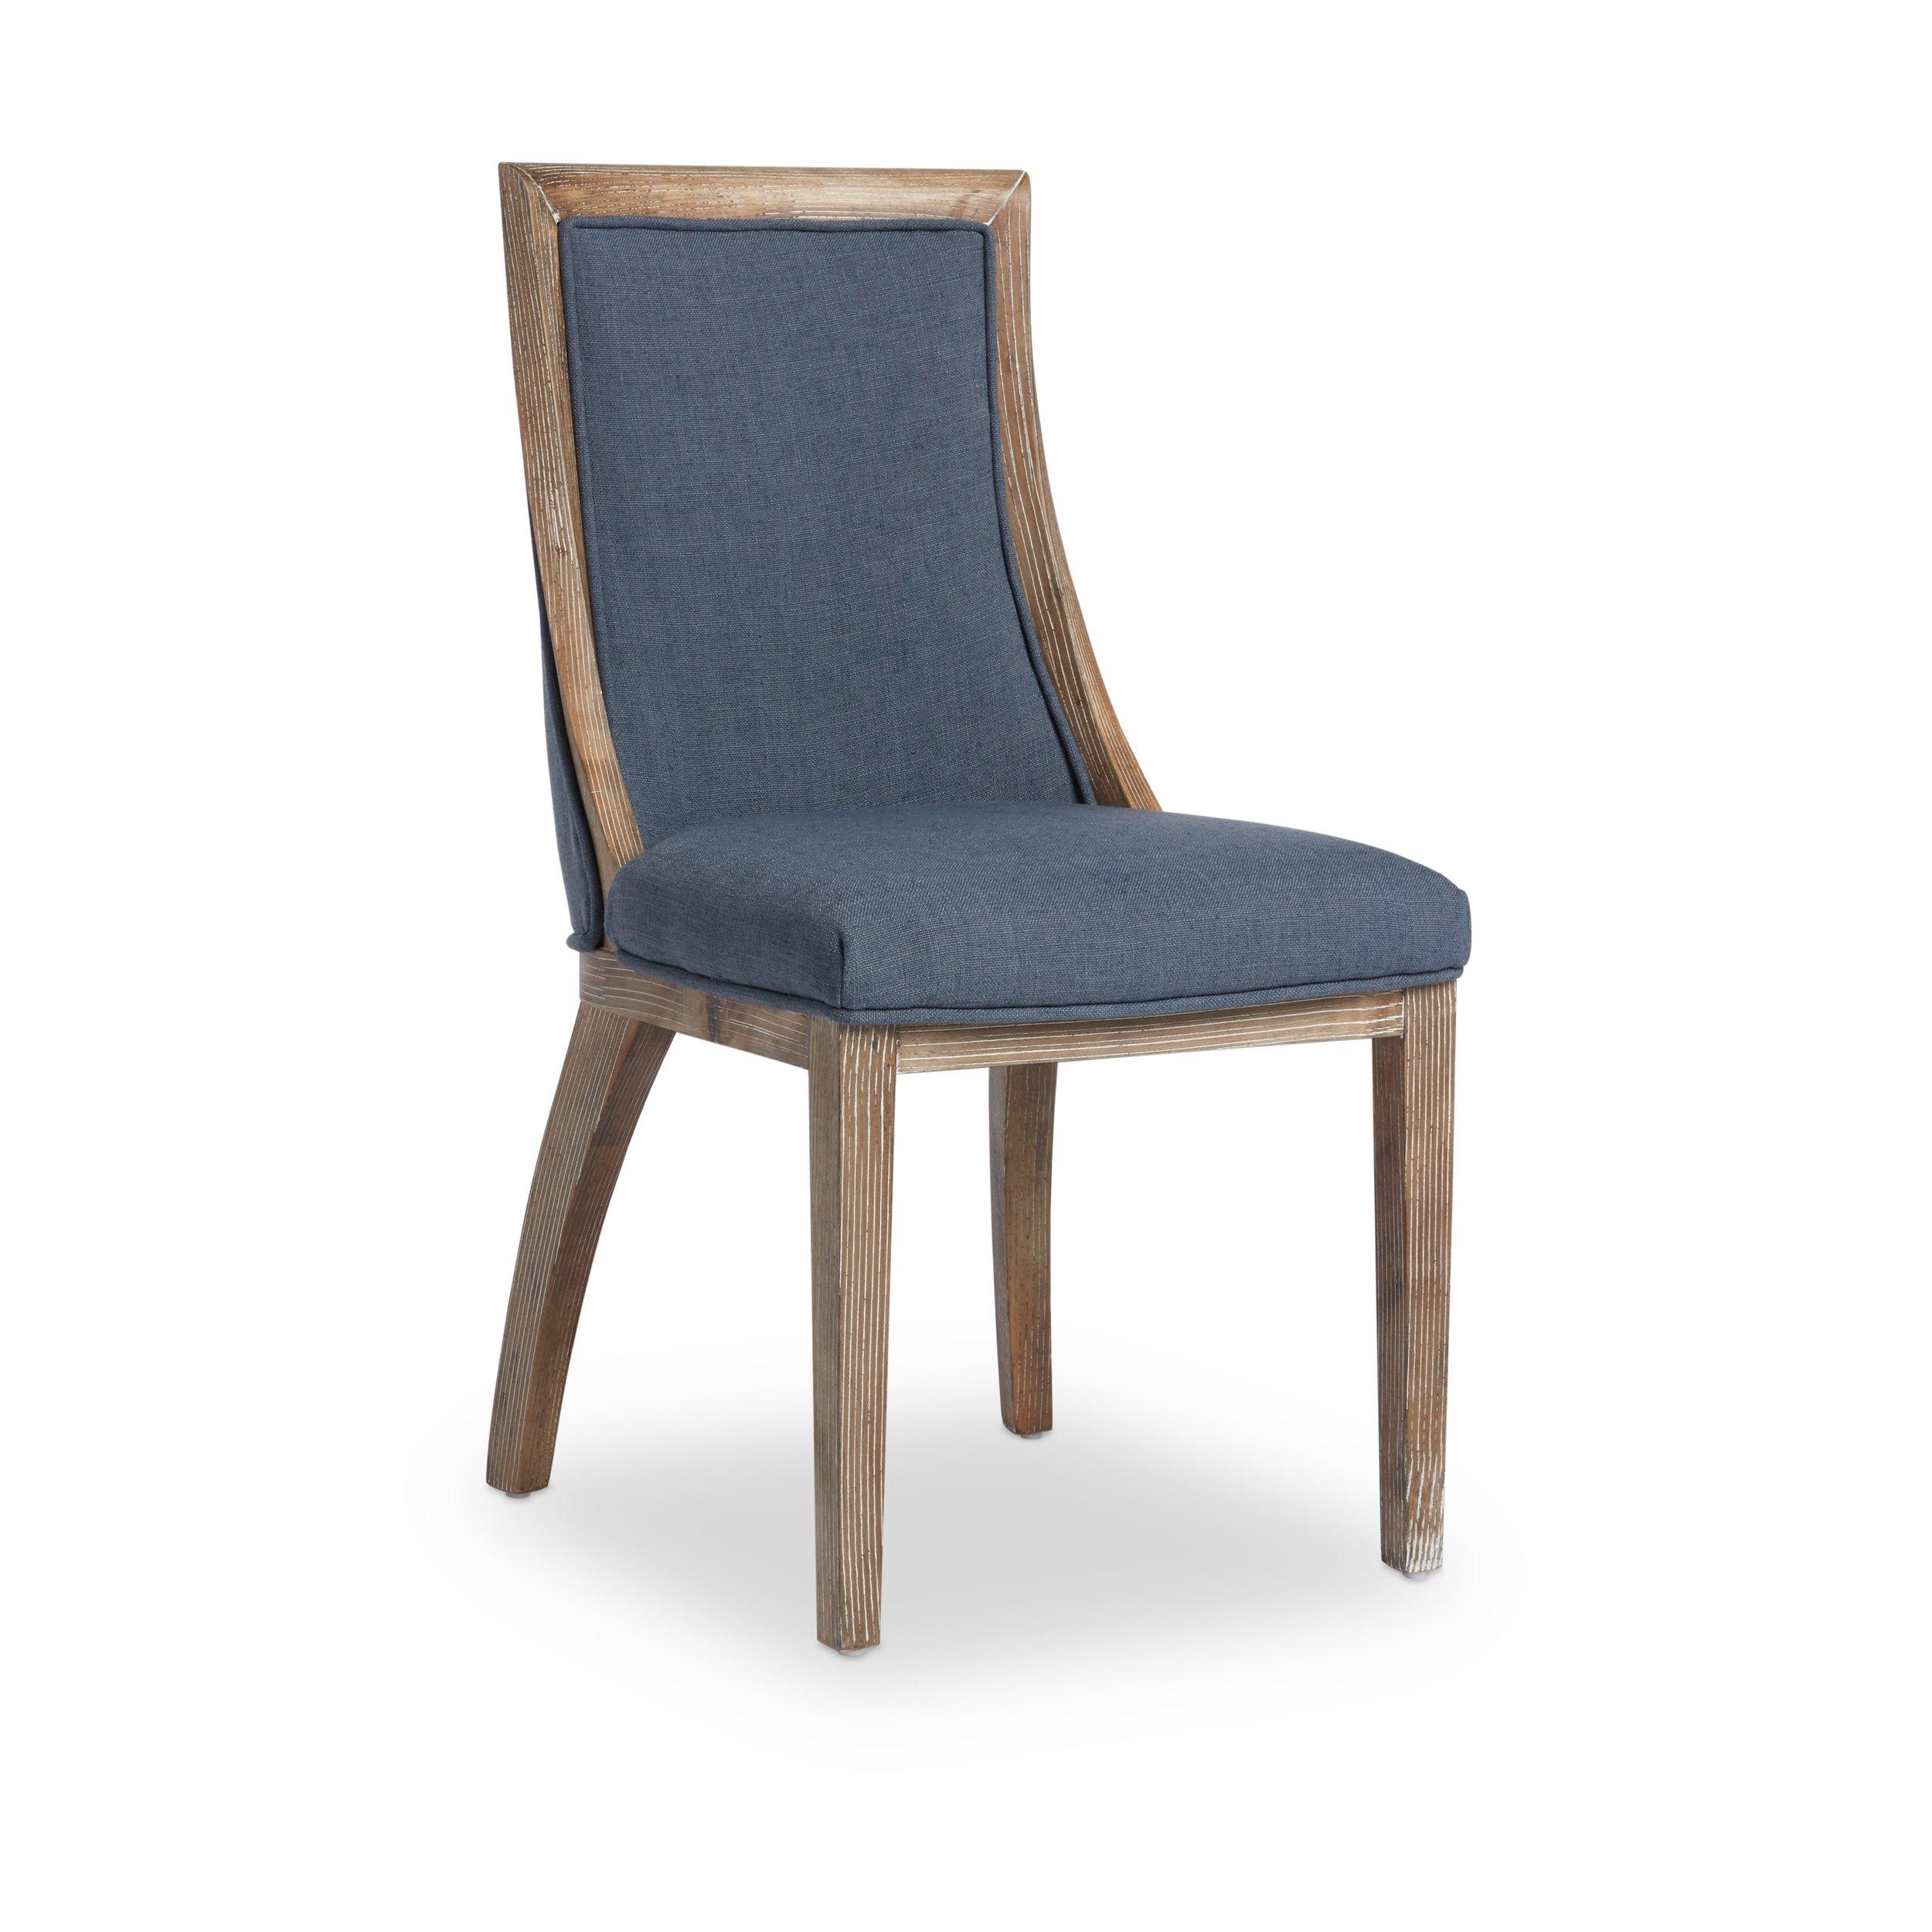 The-Gray-Barn-Park-Avenue-Austria-Navy-Linen-Dining-Chair-Set-of-2-940c8585-e319-4ab3-986c-545dba2e5d7e.jpg